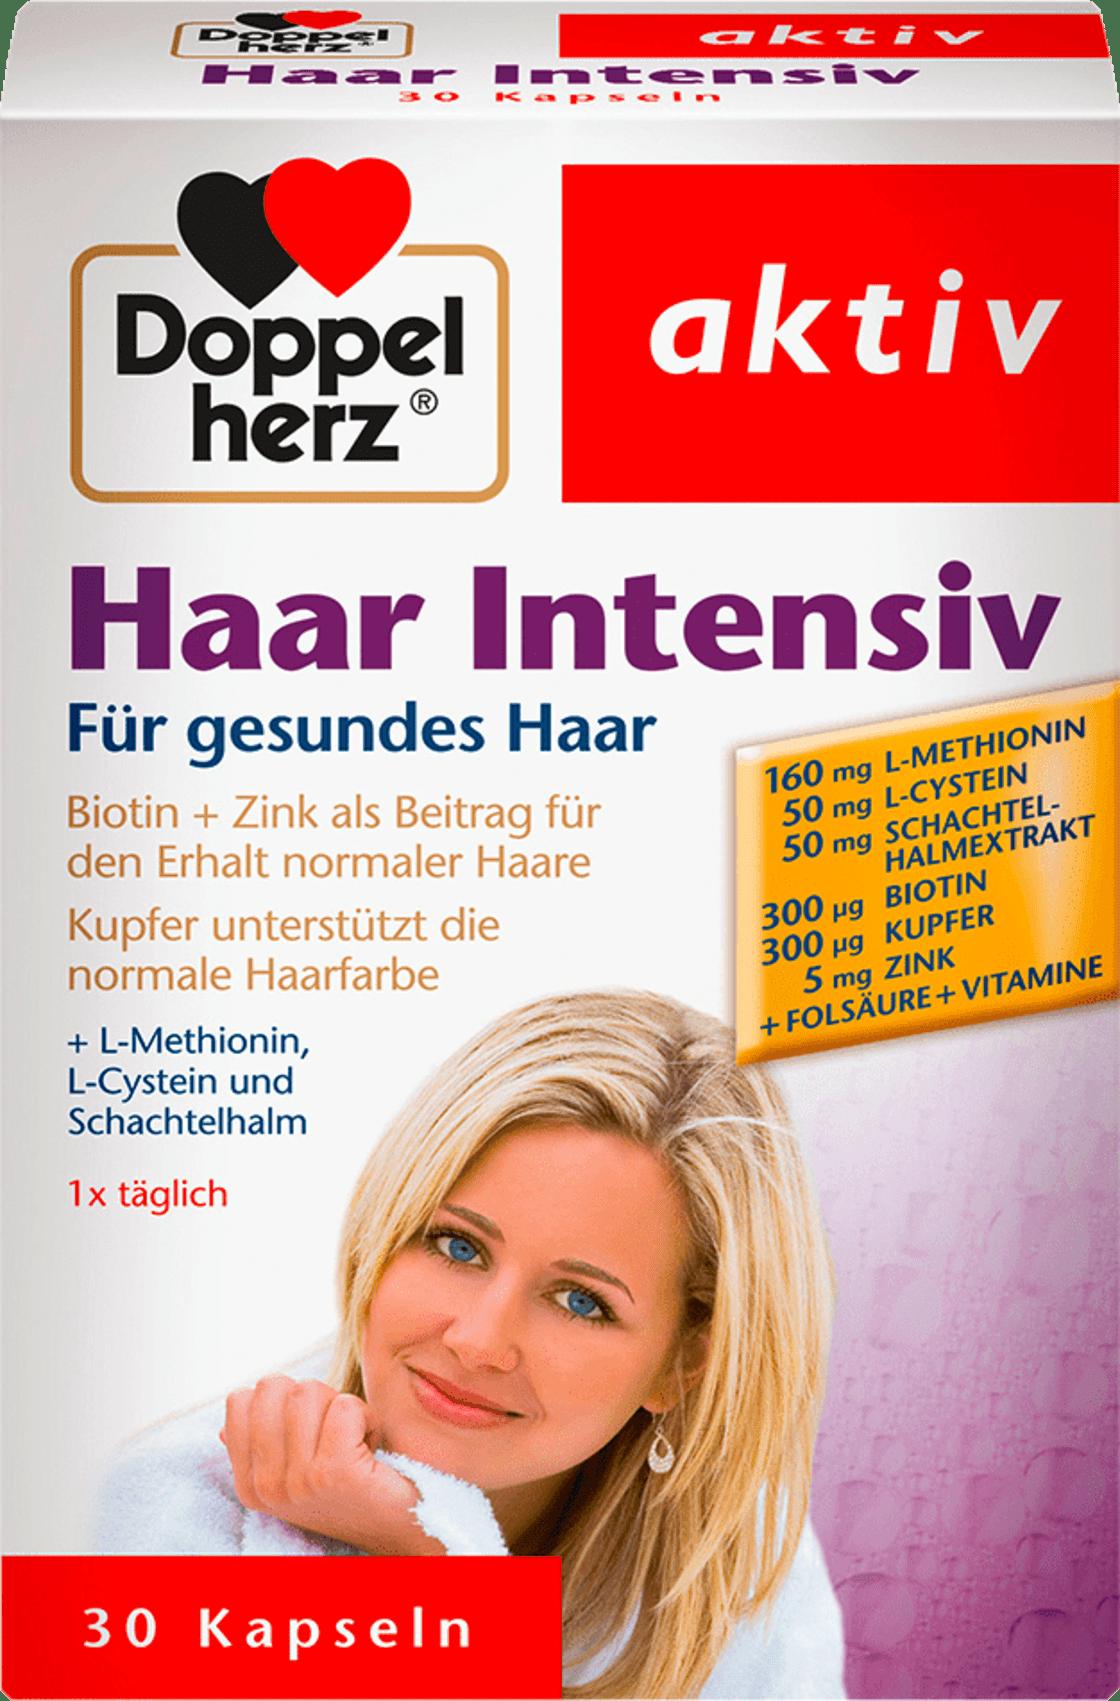 Details About Doppelherz Haar Intensiv Hair Dietary Supplement Health Care From Germany